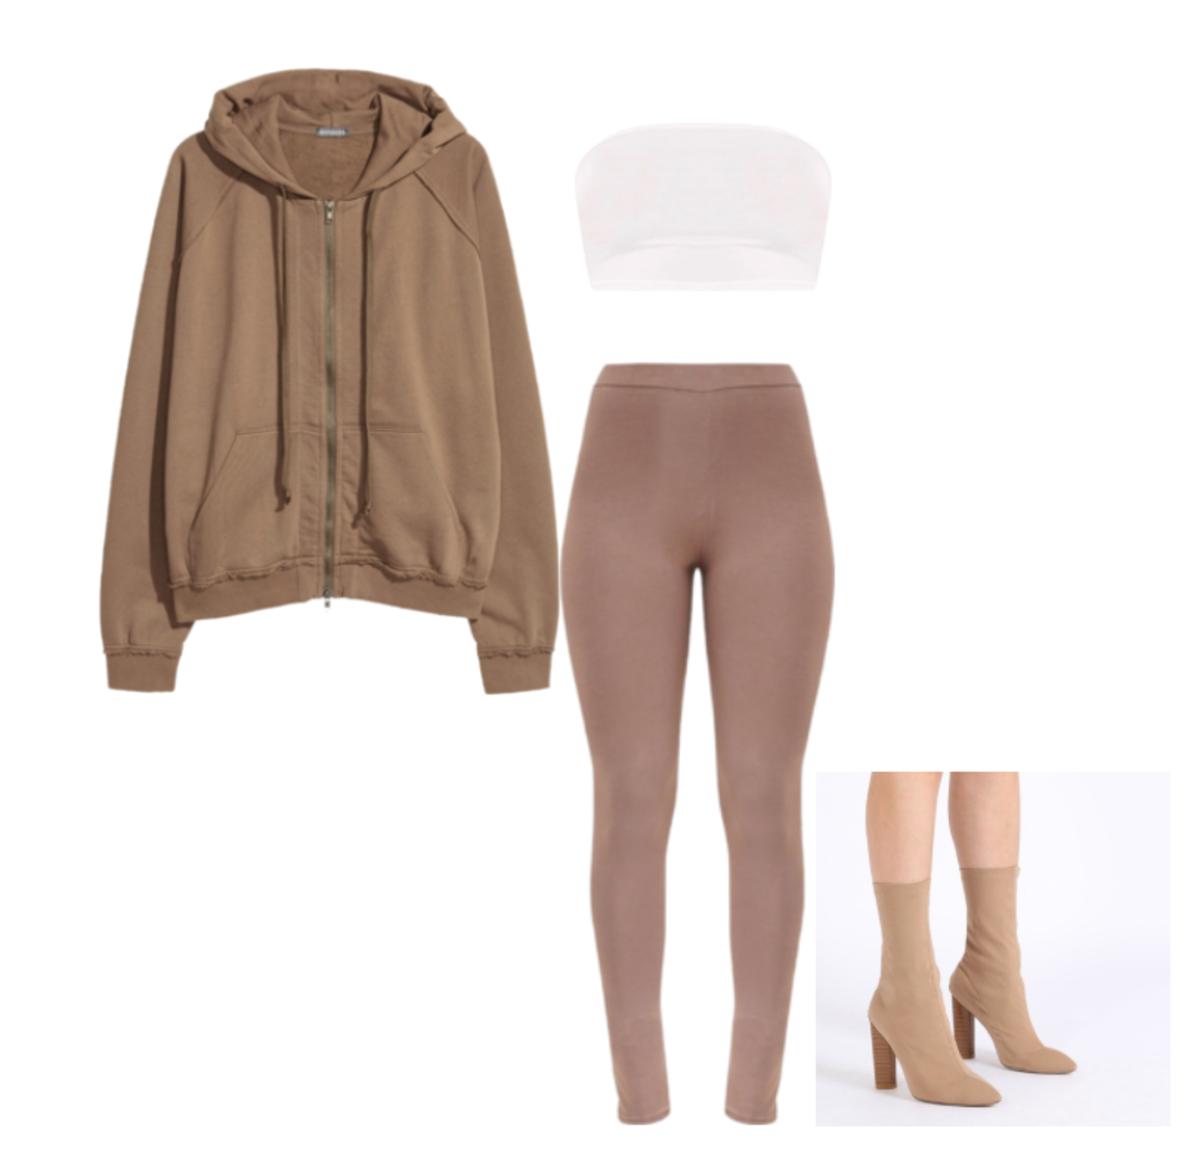 fdaa297f05221 Outfits inspired by Yeezy Season 6. Kim Kardashian inspired looks. Neutral